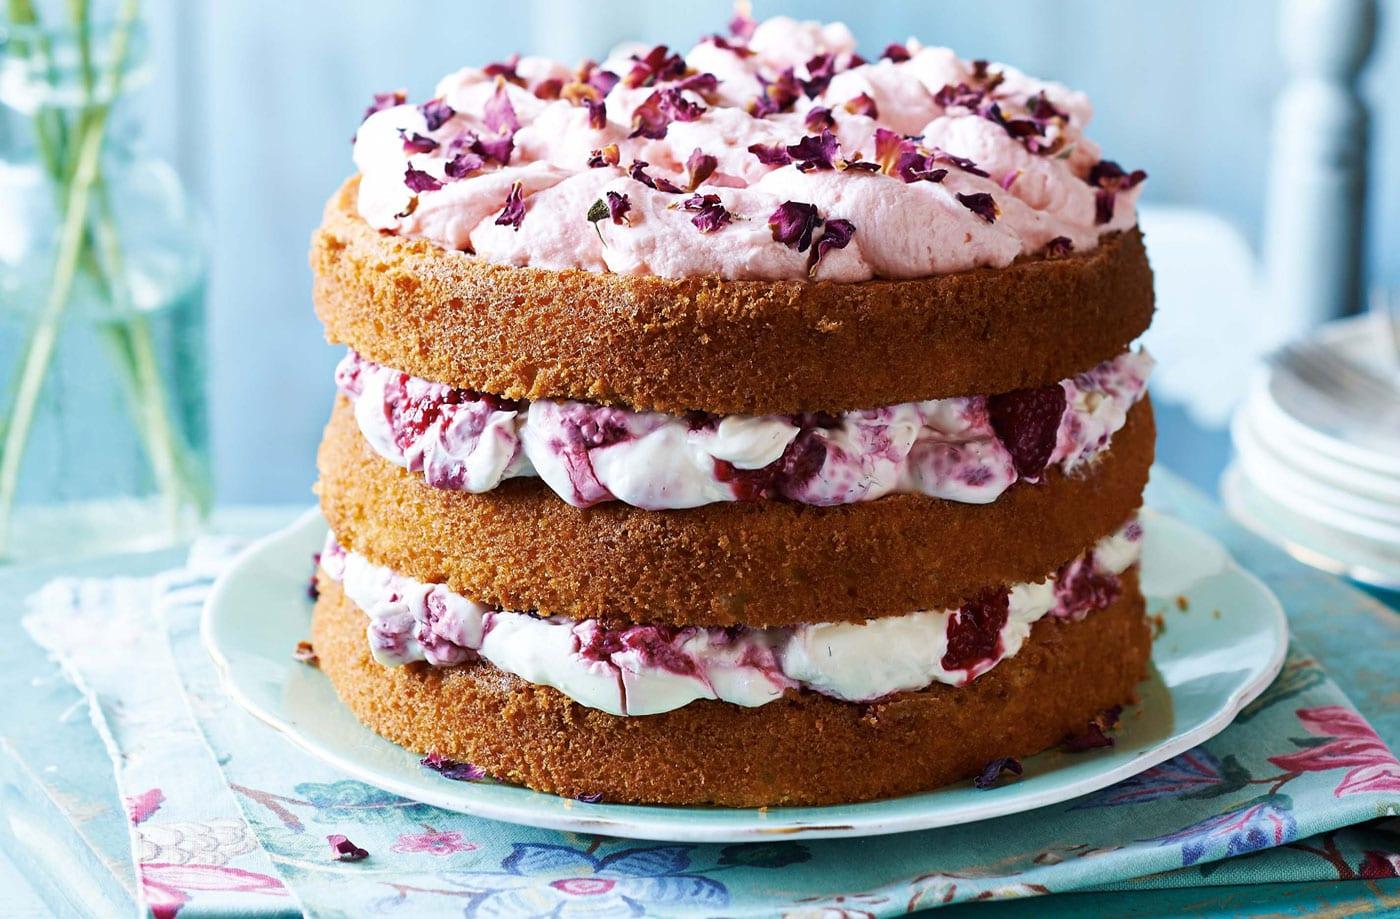 Tesco Mothers Day Raspberry Cake24273 LH 2e54800d 8d04 4bd3 a826 fcb02b1cbc15 0 1400x919